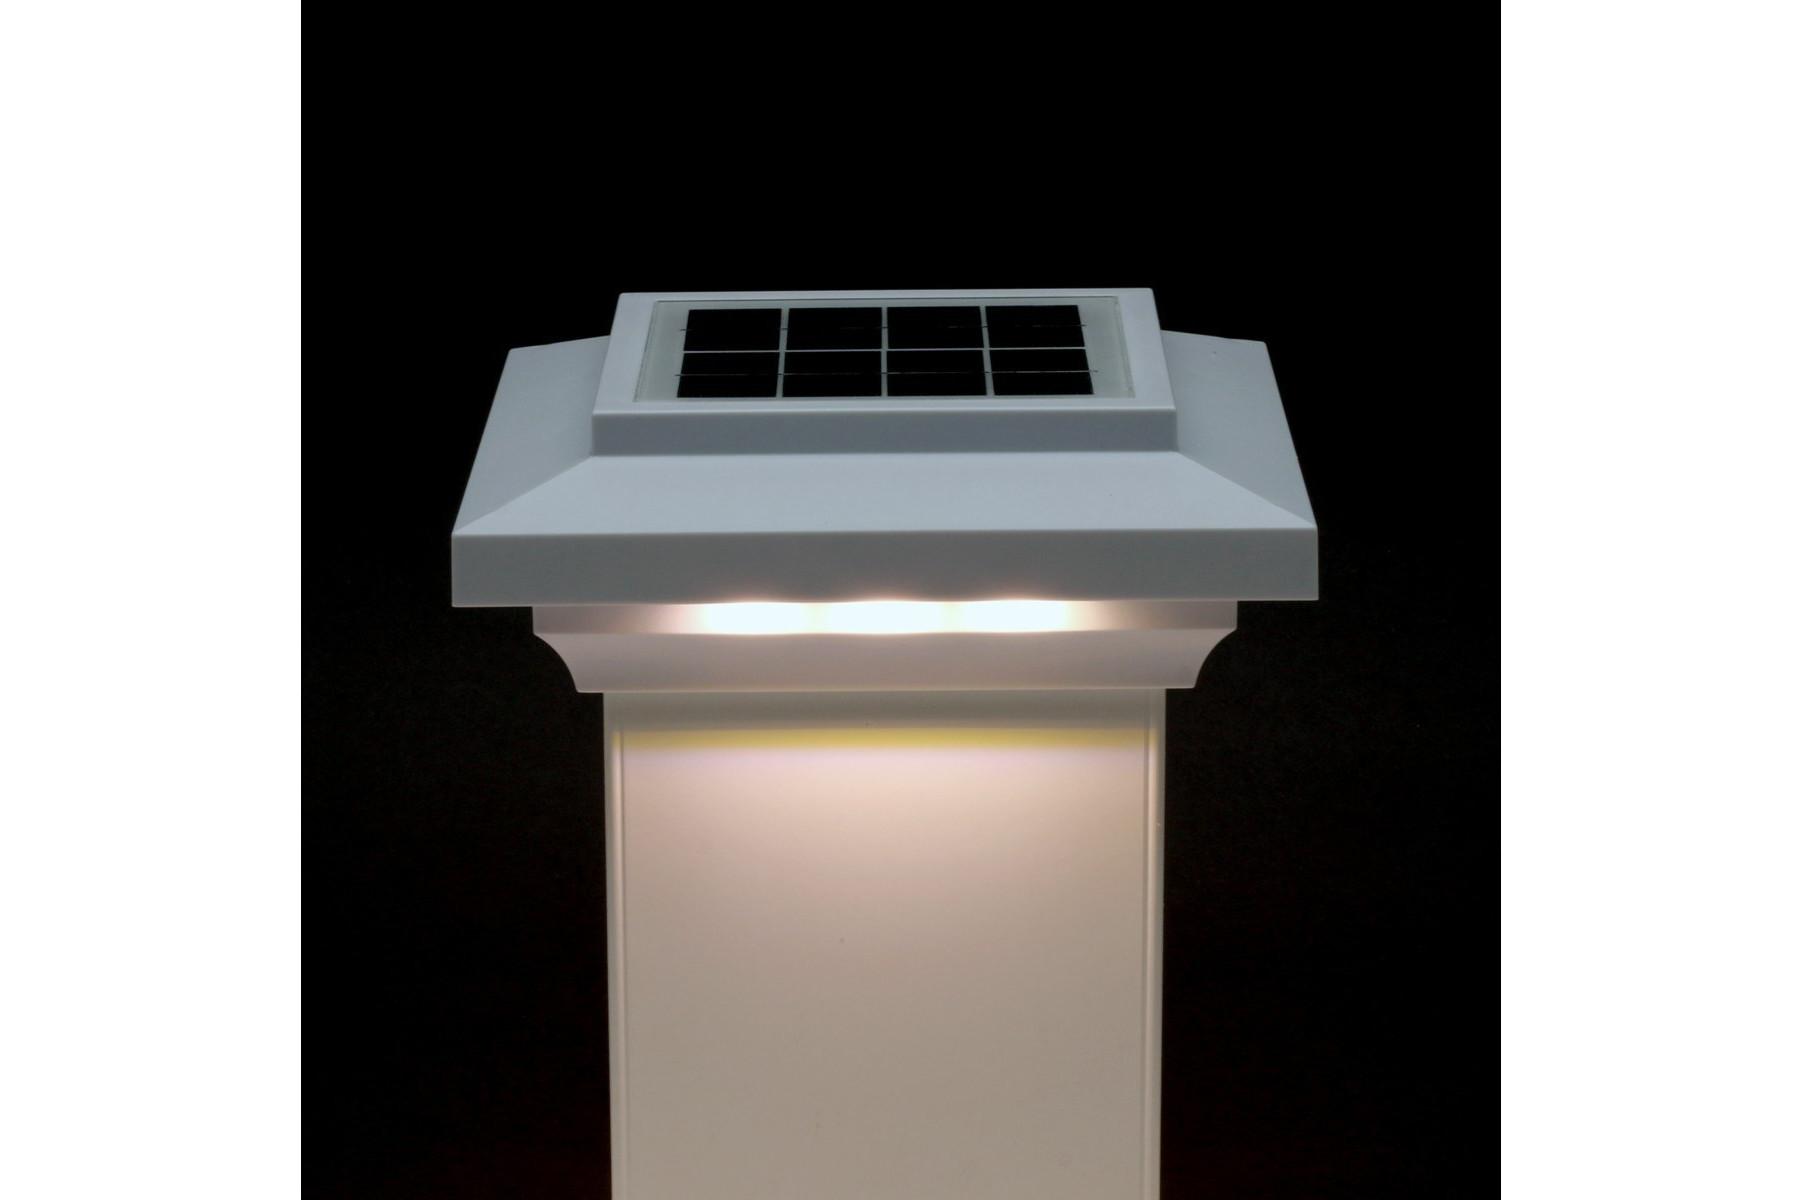 5-1/2 in  x 5-1/2 in  Solar Post Cap Light for Azek |Trex |Wood - White - 3  LED Colors